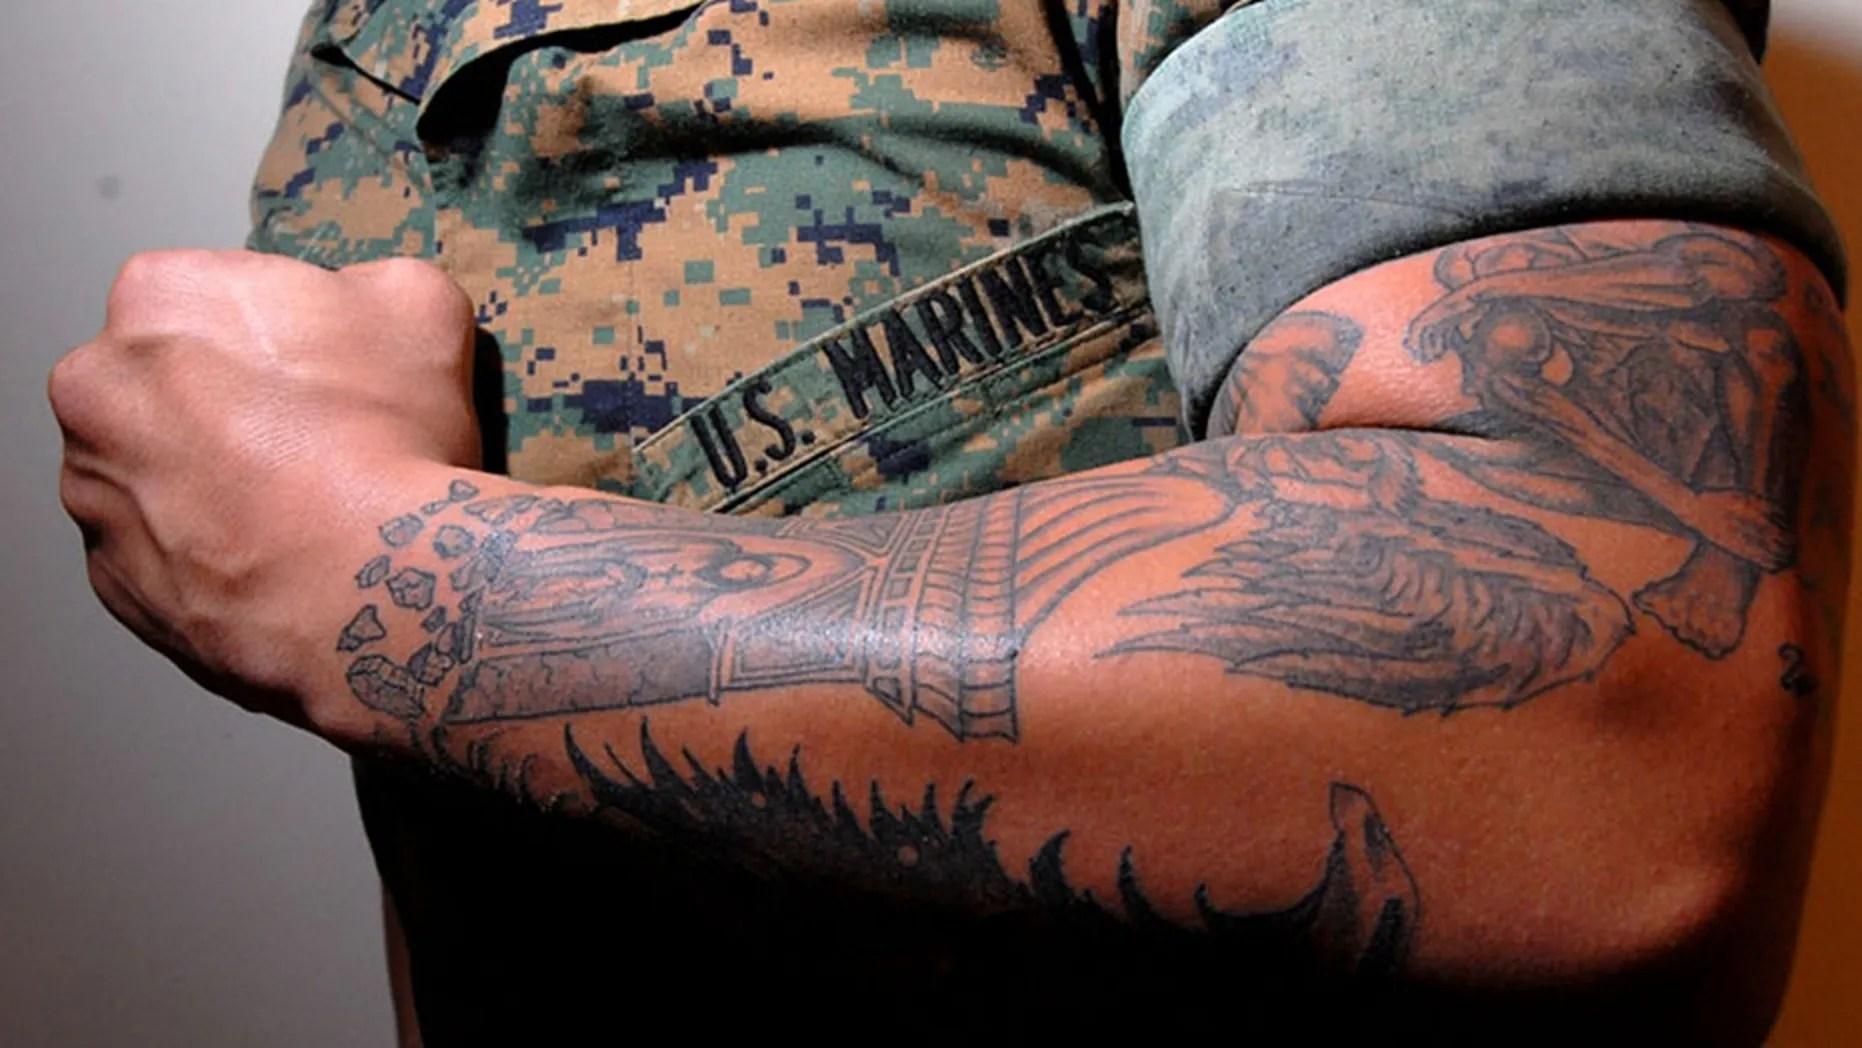 Army Sleeve Tattoo Regulations